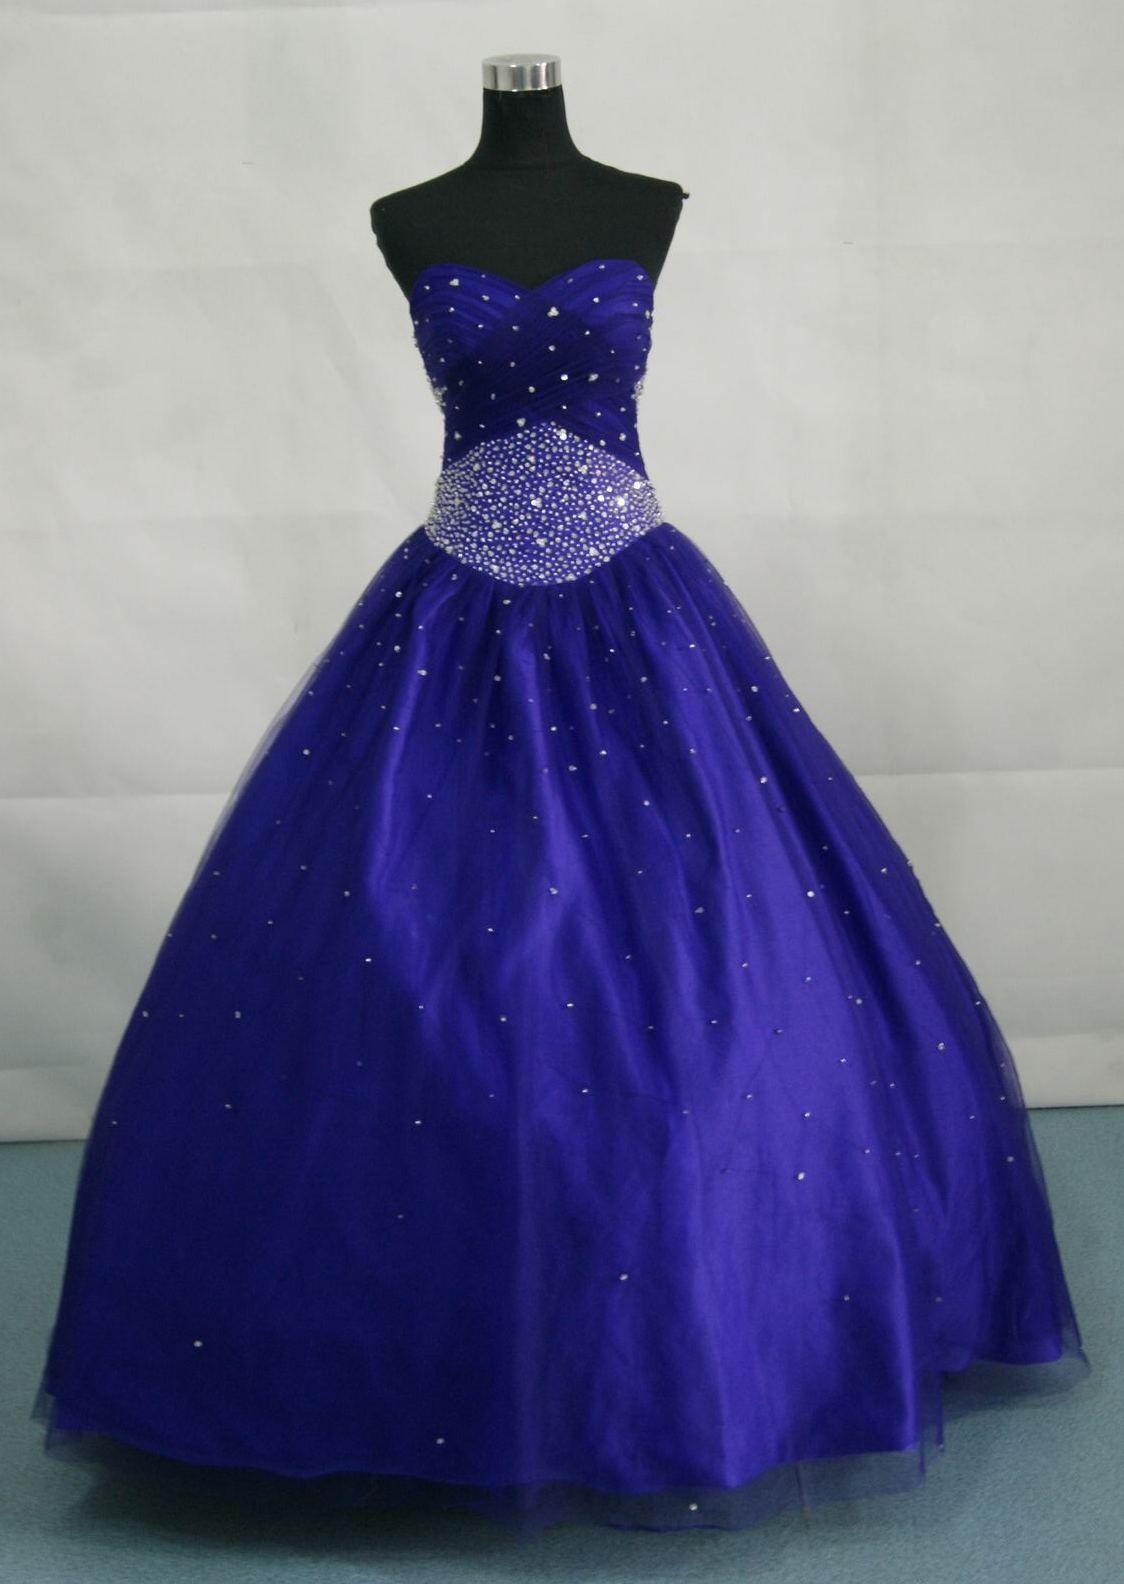 Pin by makaylah richardson on blue ball gowns pinterest ball